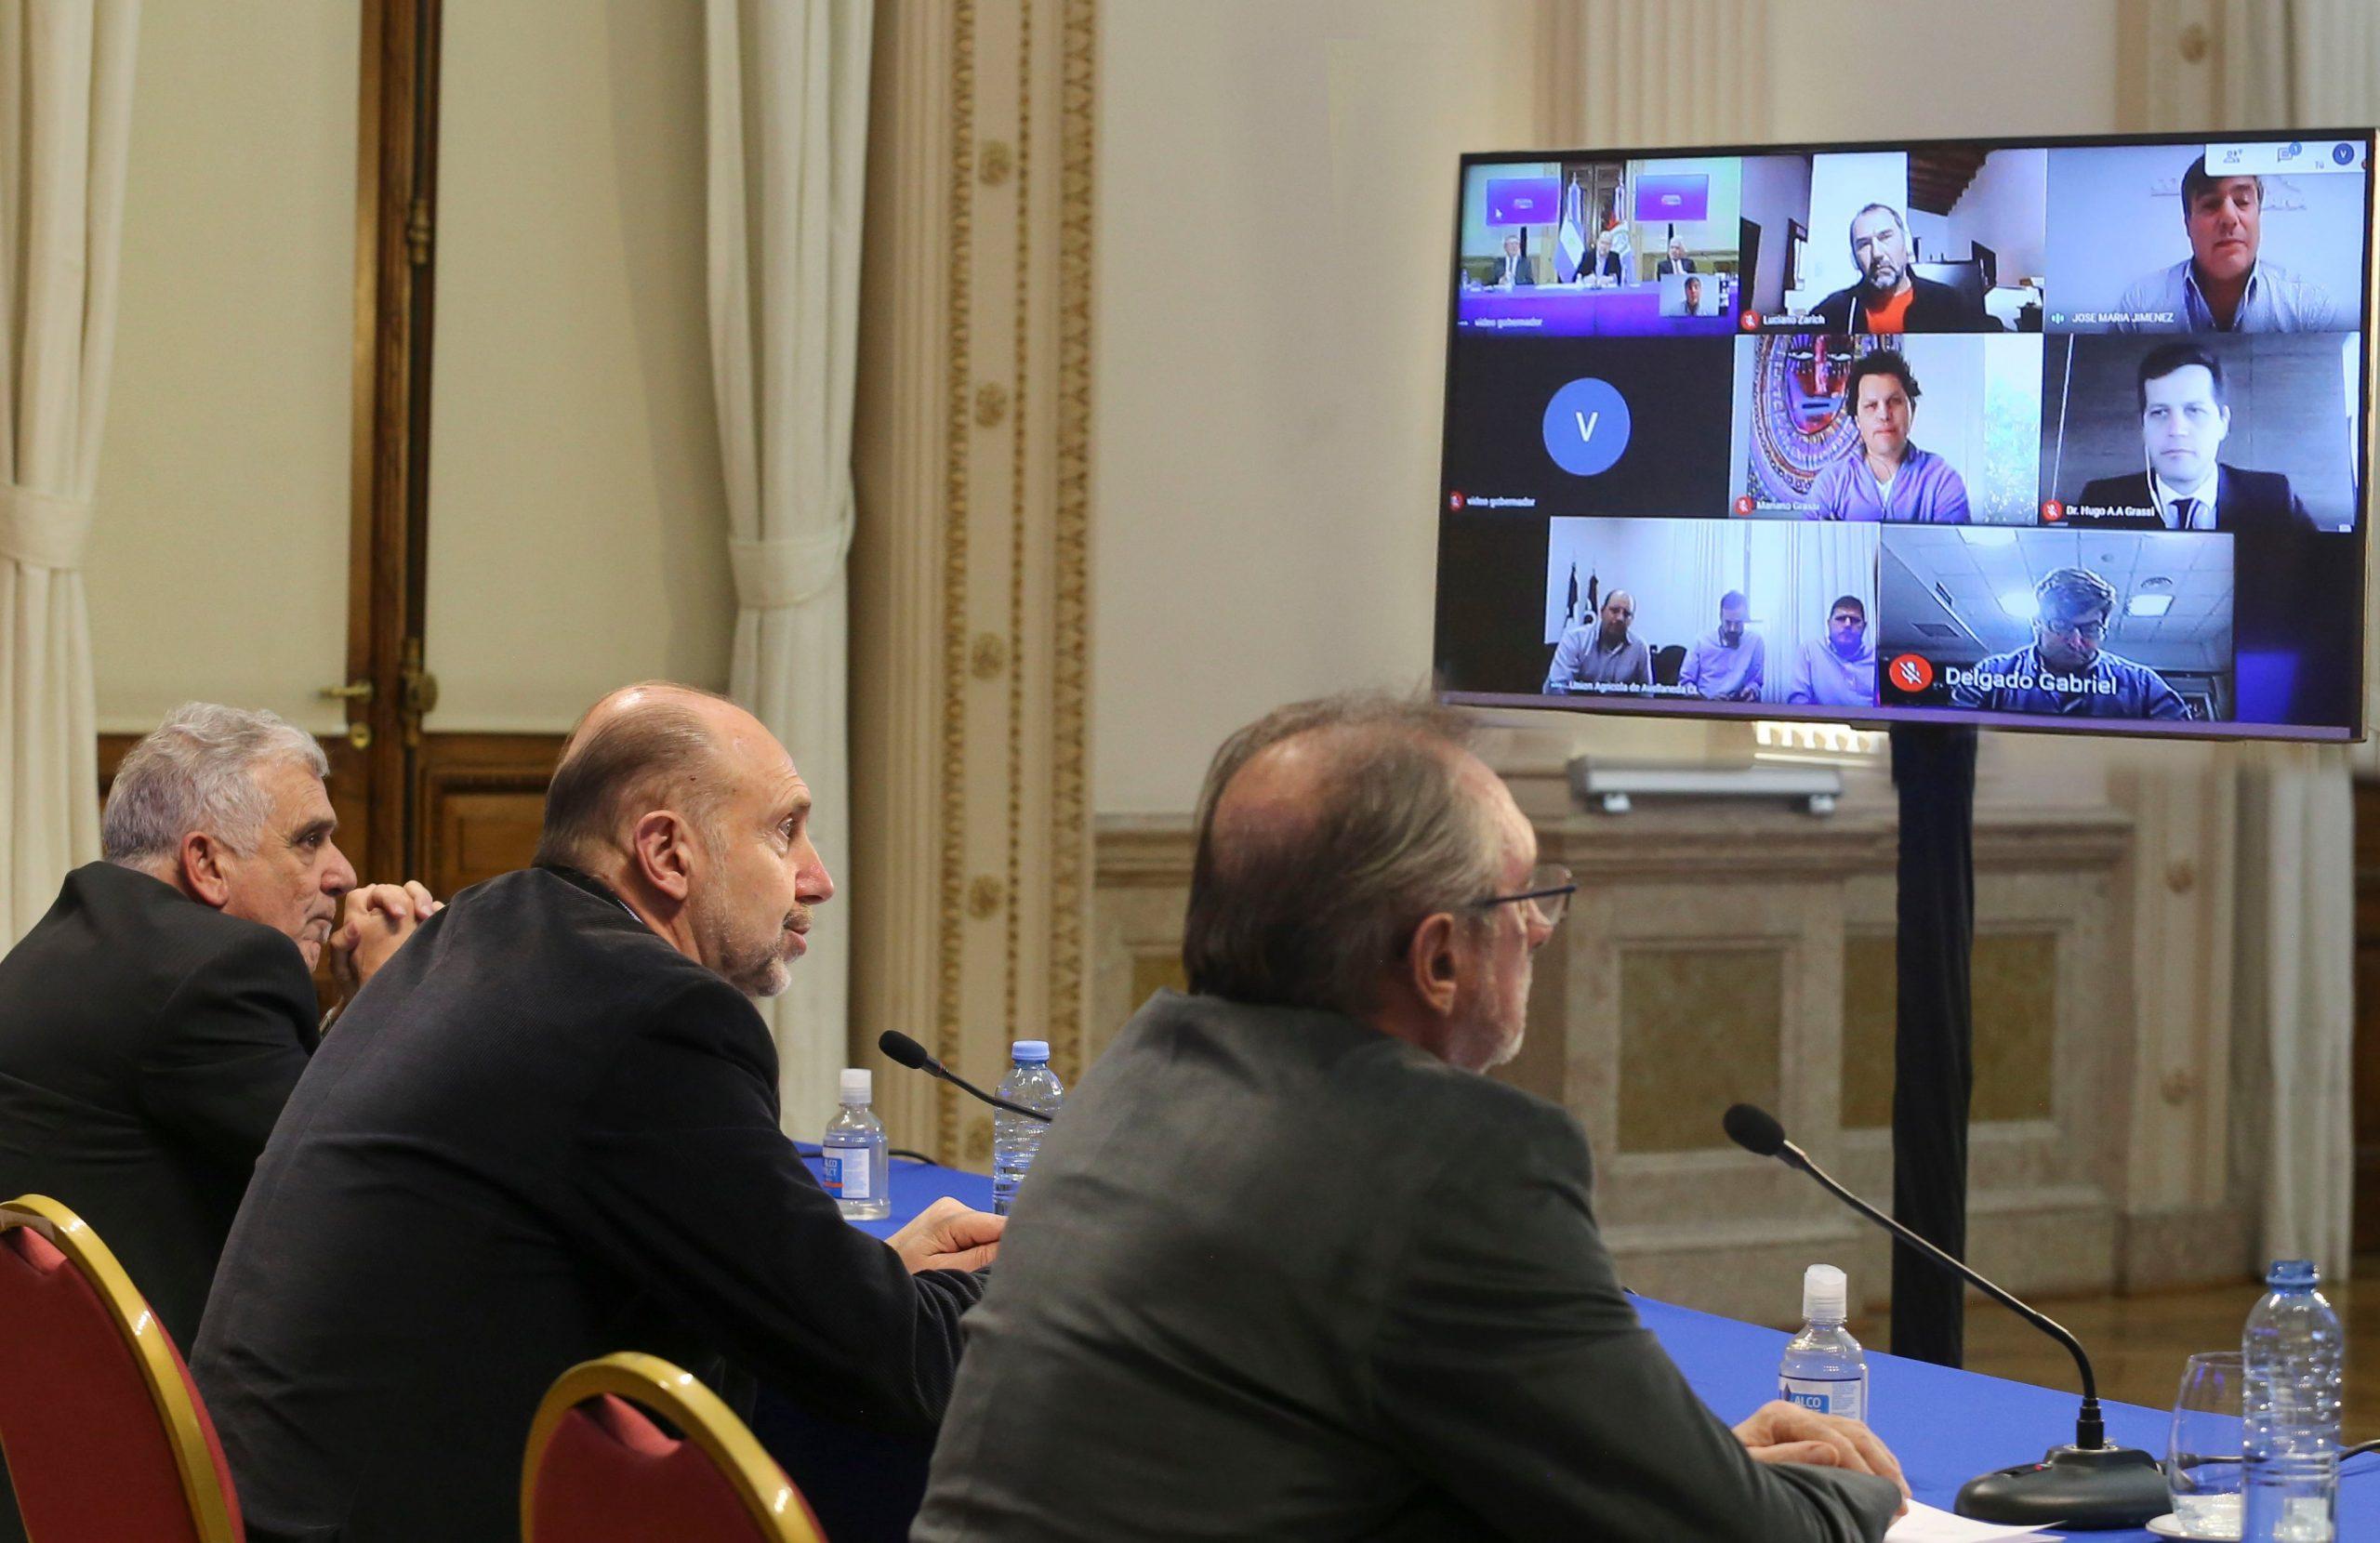 El juez Lorenzini abre solo proceso de «incidente» tras pedido de Perotti de intervenir Vicentin